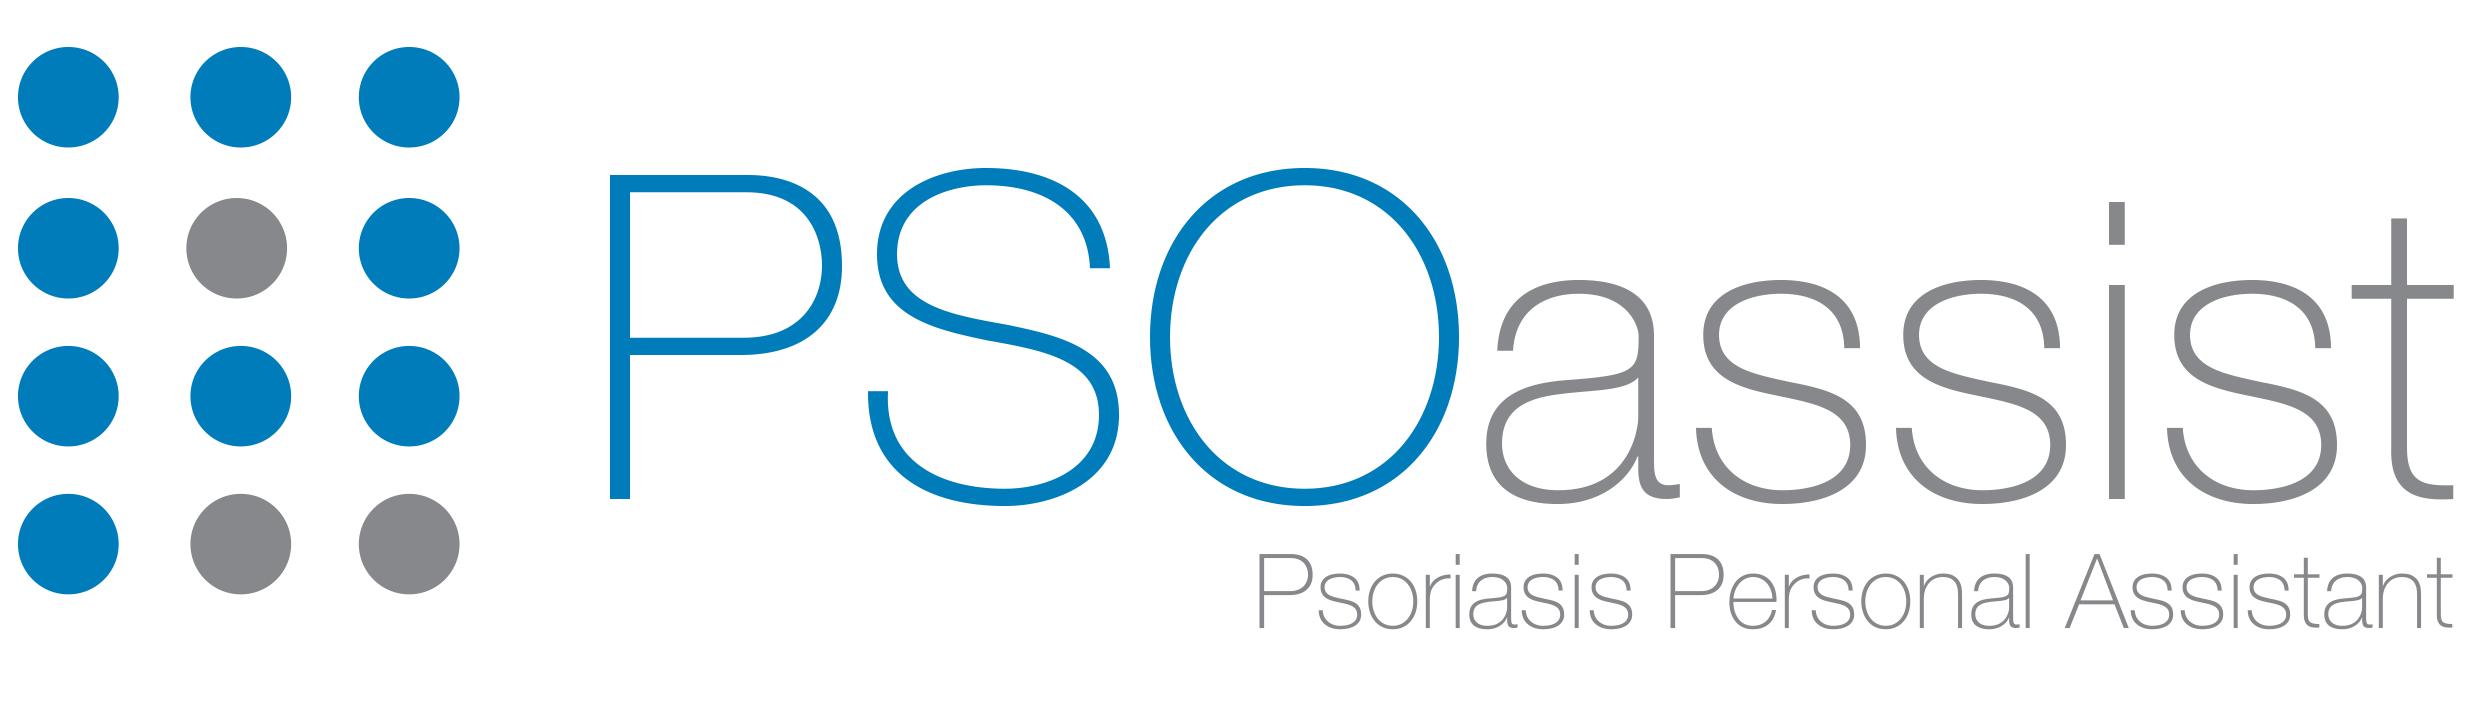 logo-psoassist